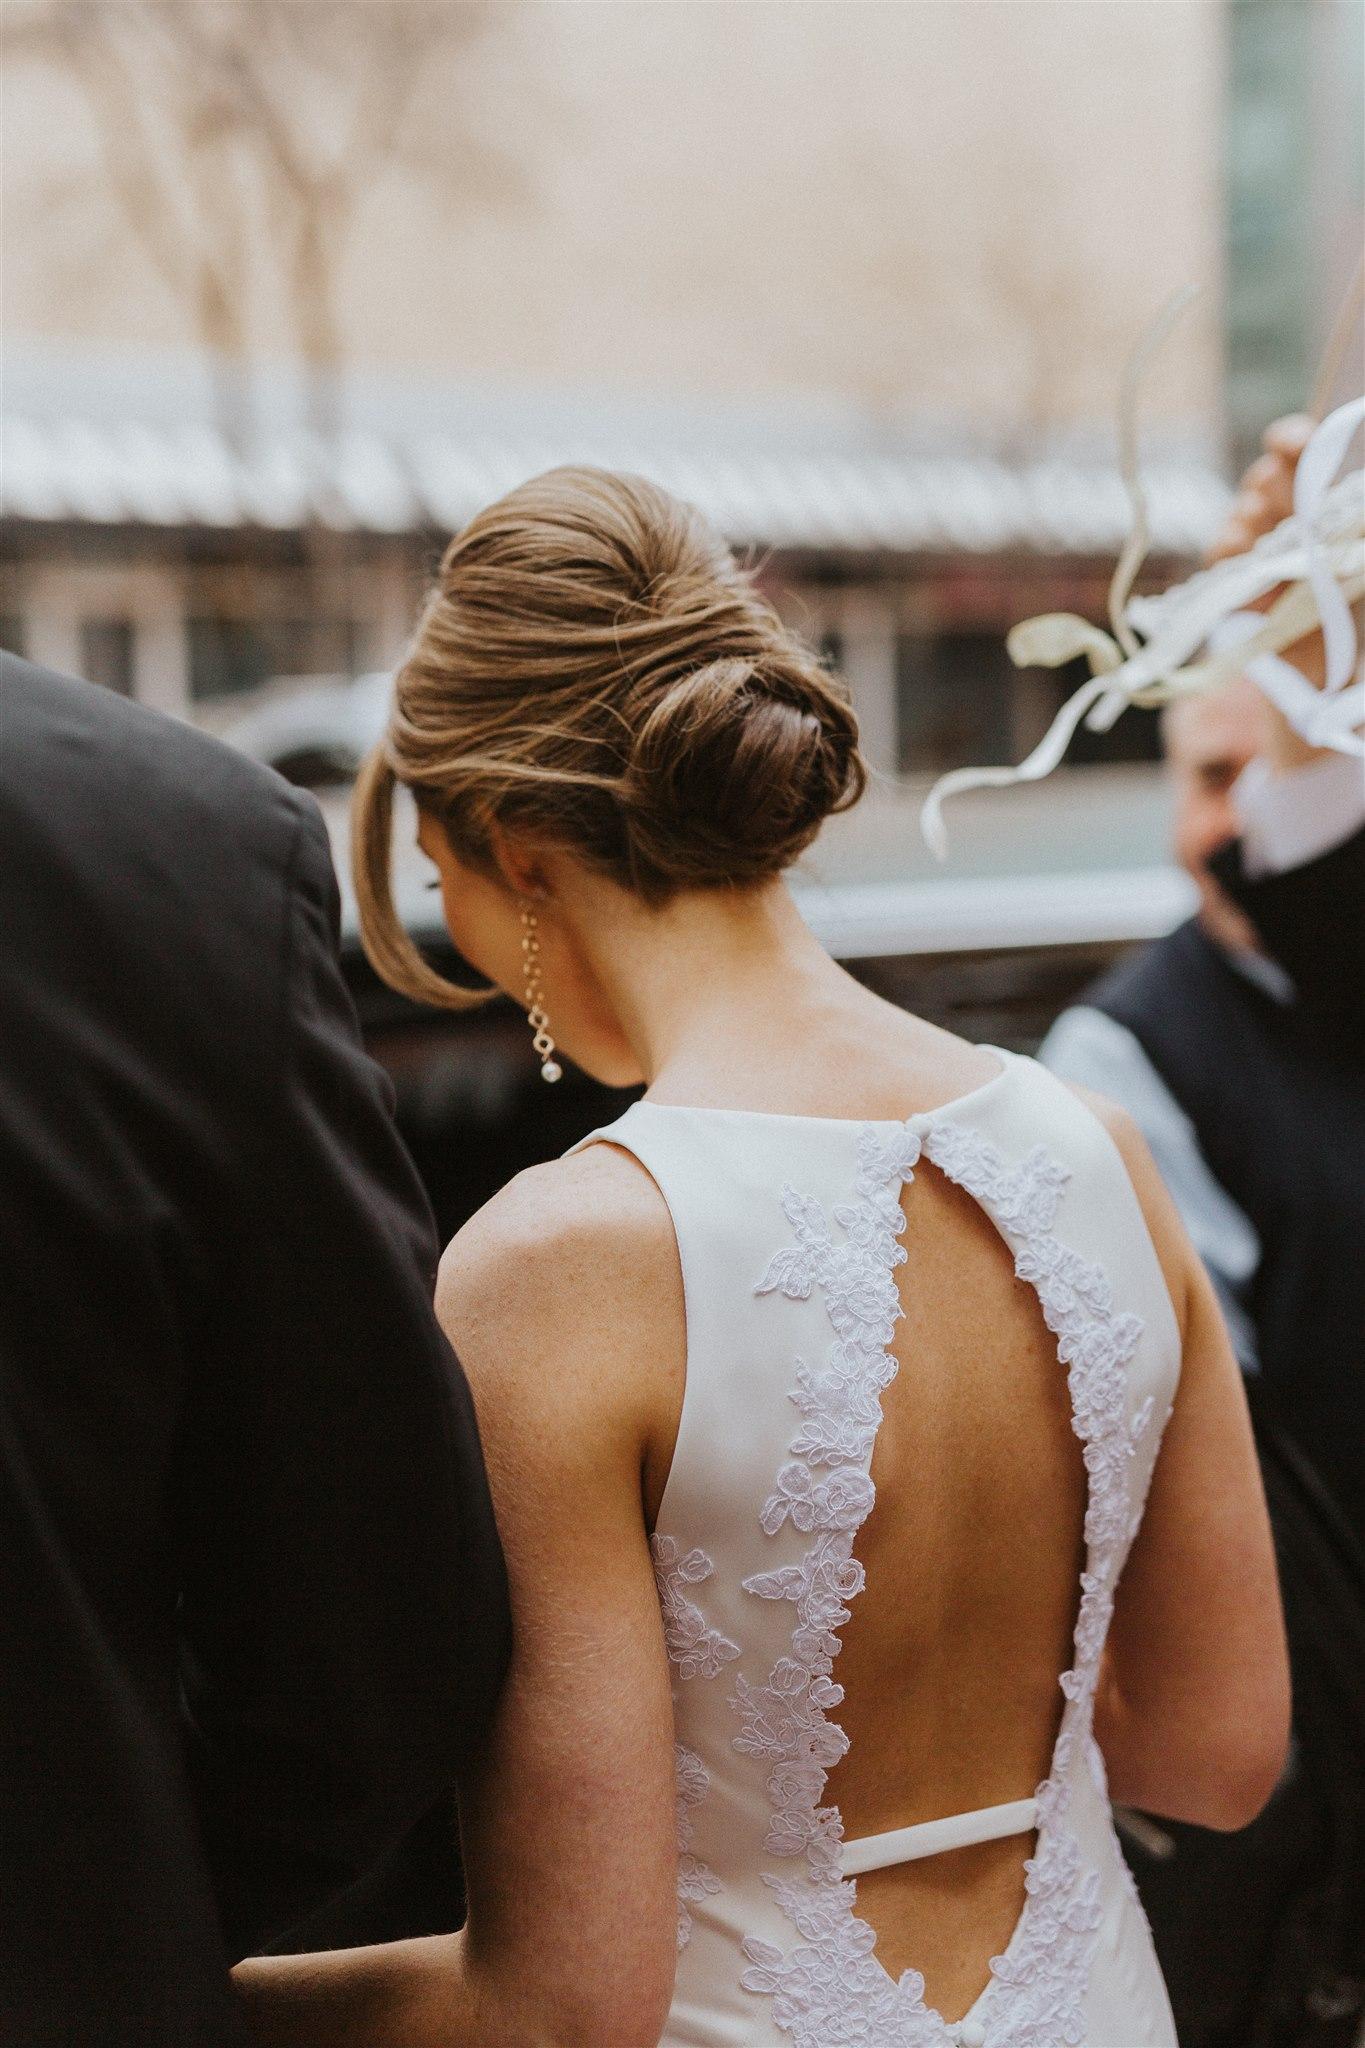 Katy-Beth-and-Ryan-For-Worth-Wedding-HauserPhotography-1032.jpg